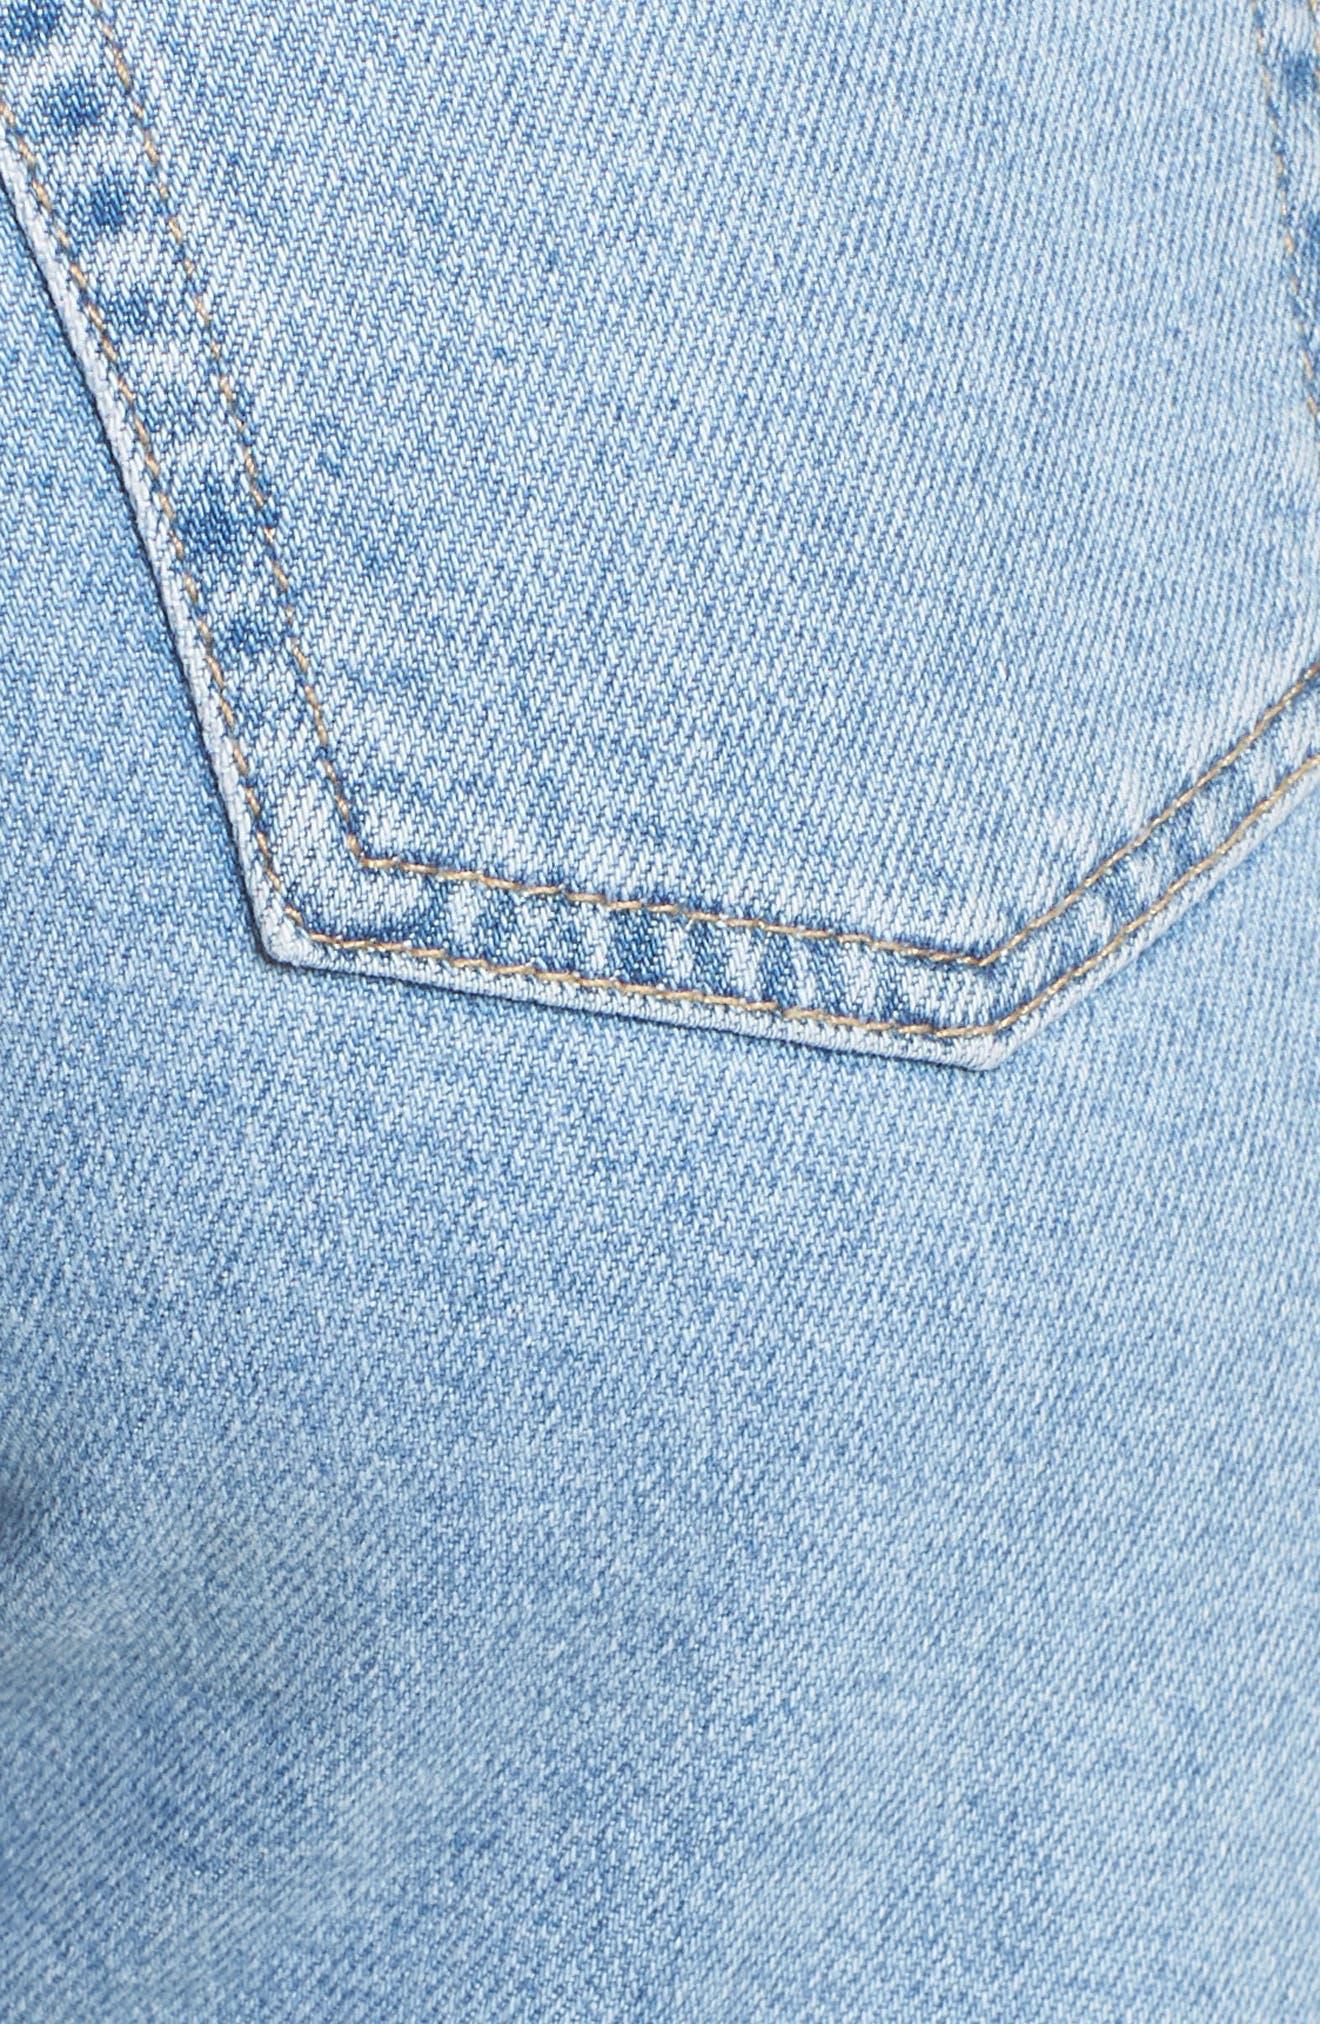 TOPSHOP, Raw Hem Straight Leg Jeans, Alternate thumbnail 6, color, BLEACH STONE DENIM